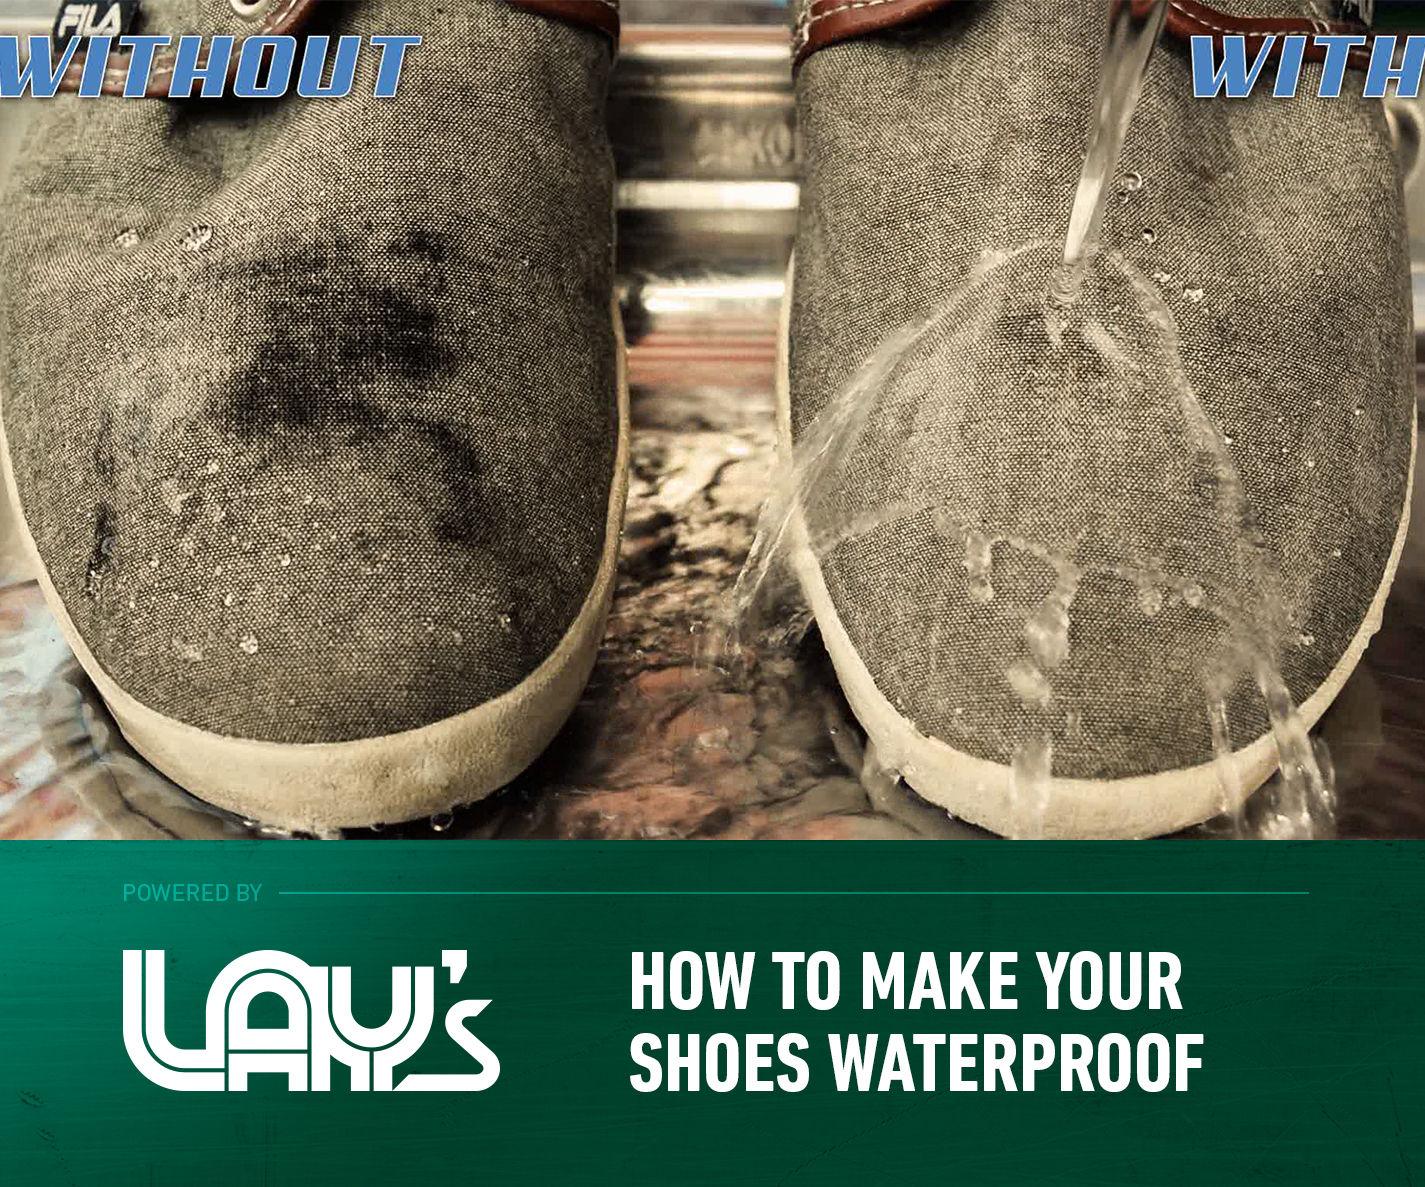 Regular Shoes to Be Waterproof